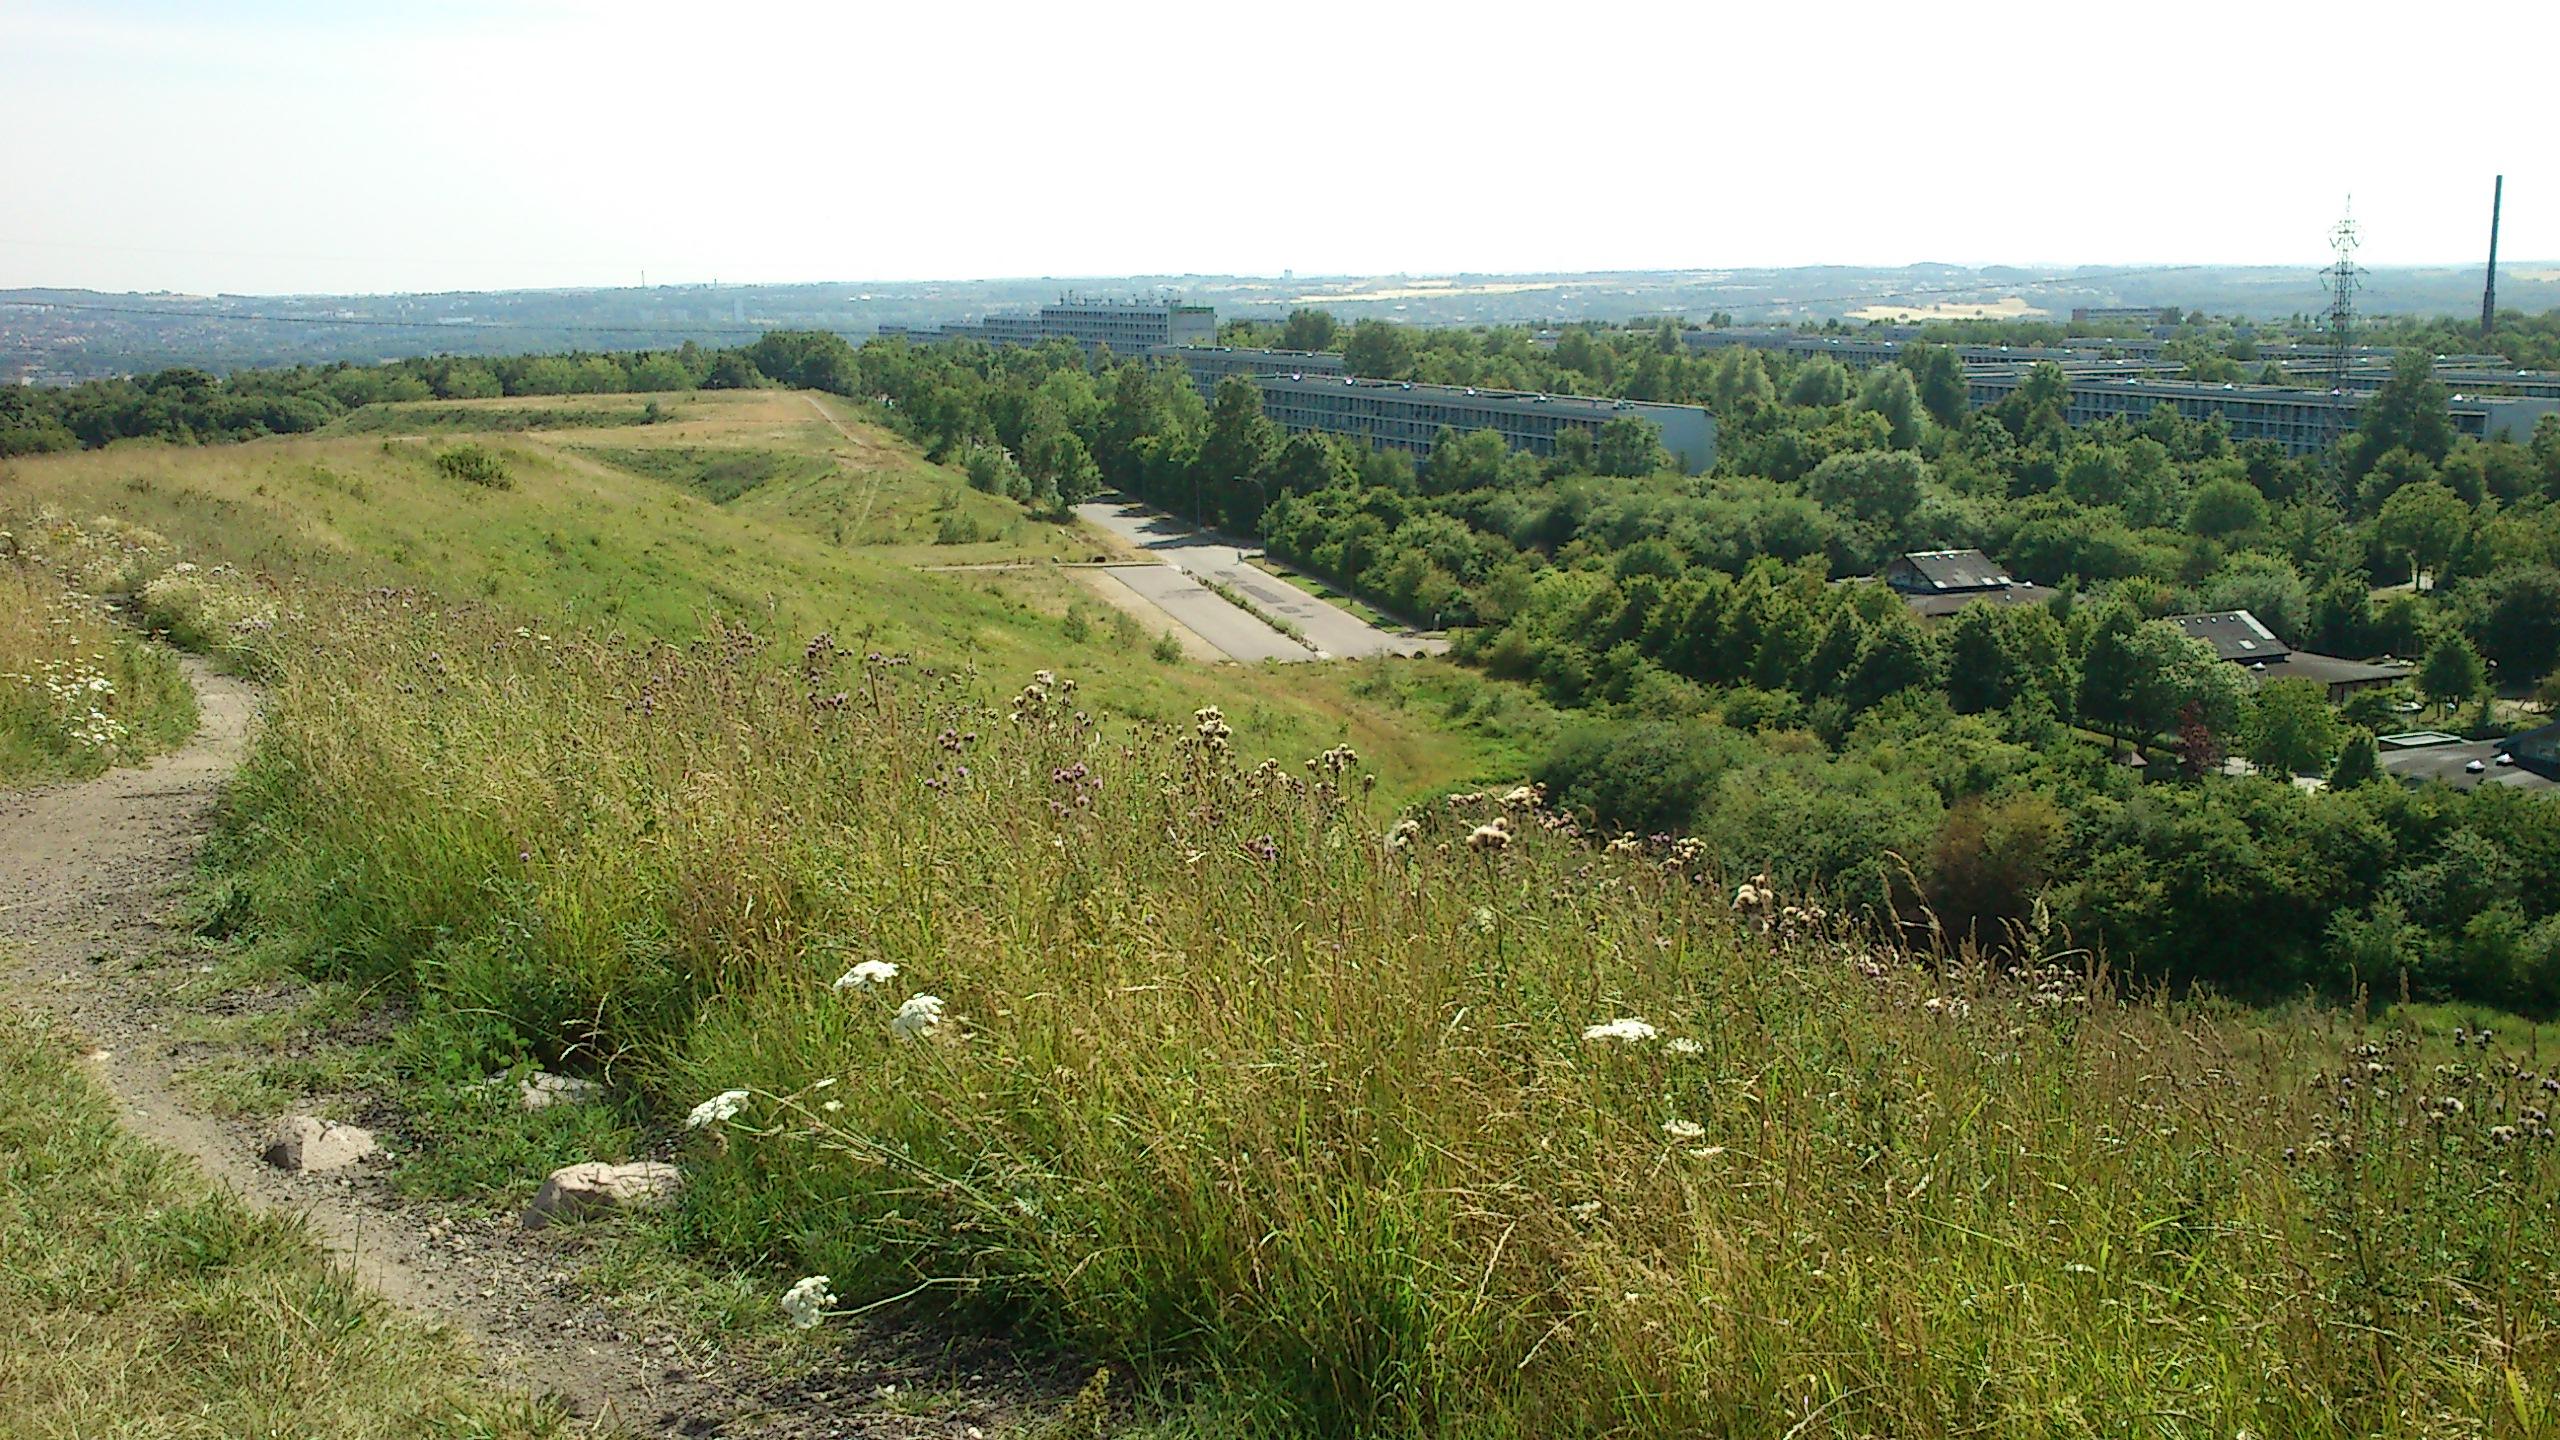 hasle hills in gellerup.jpg